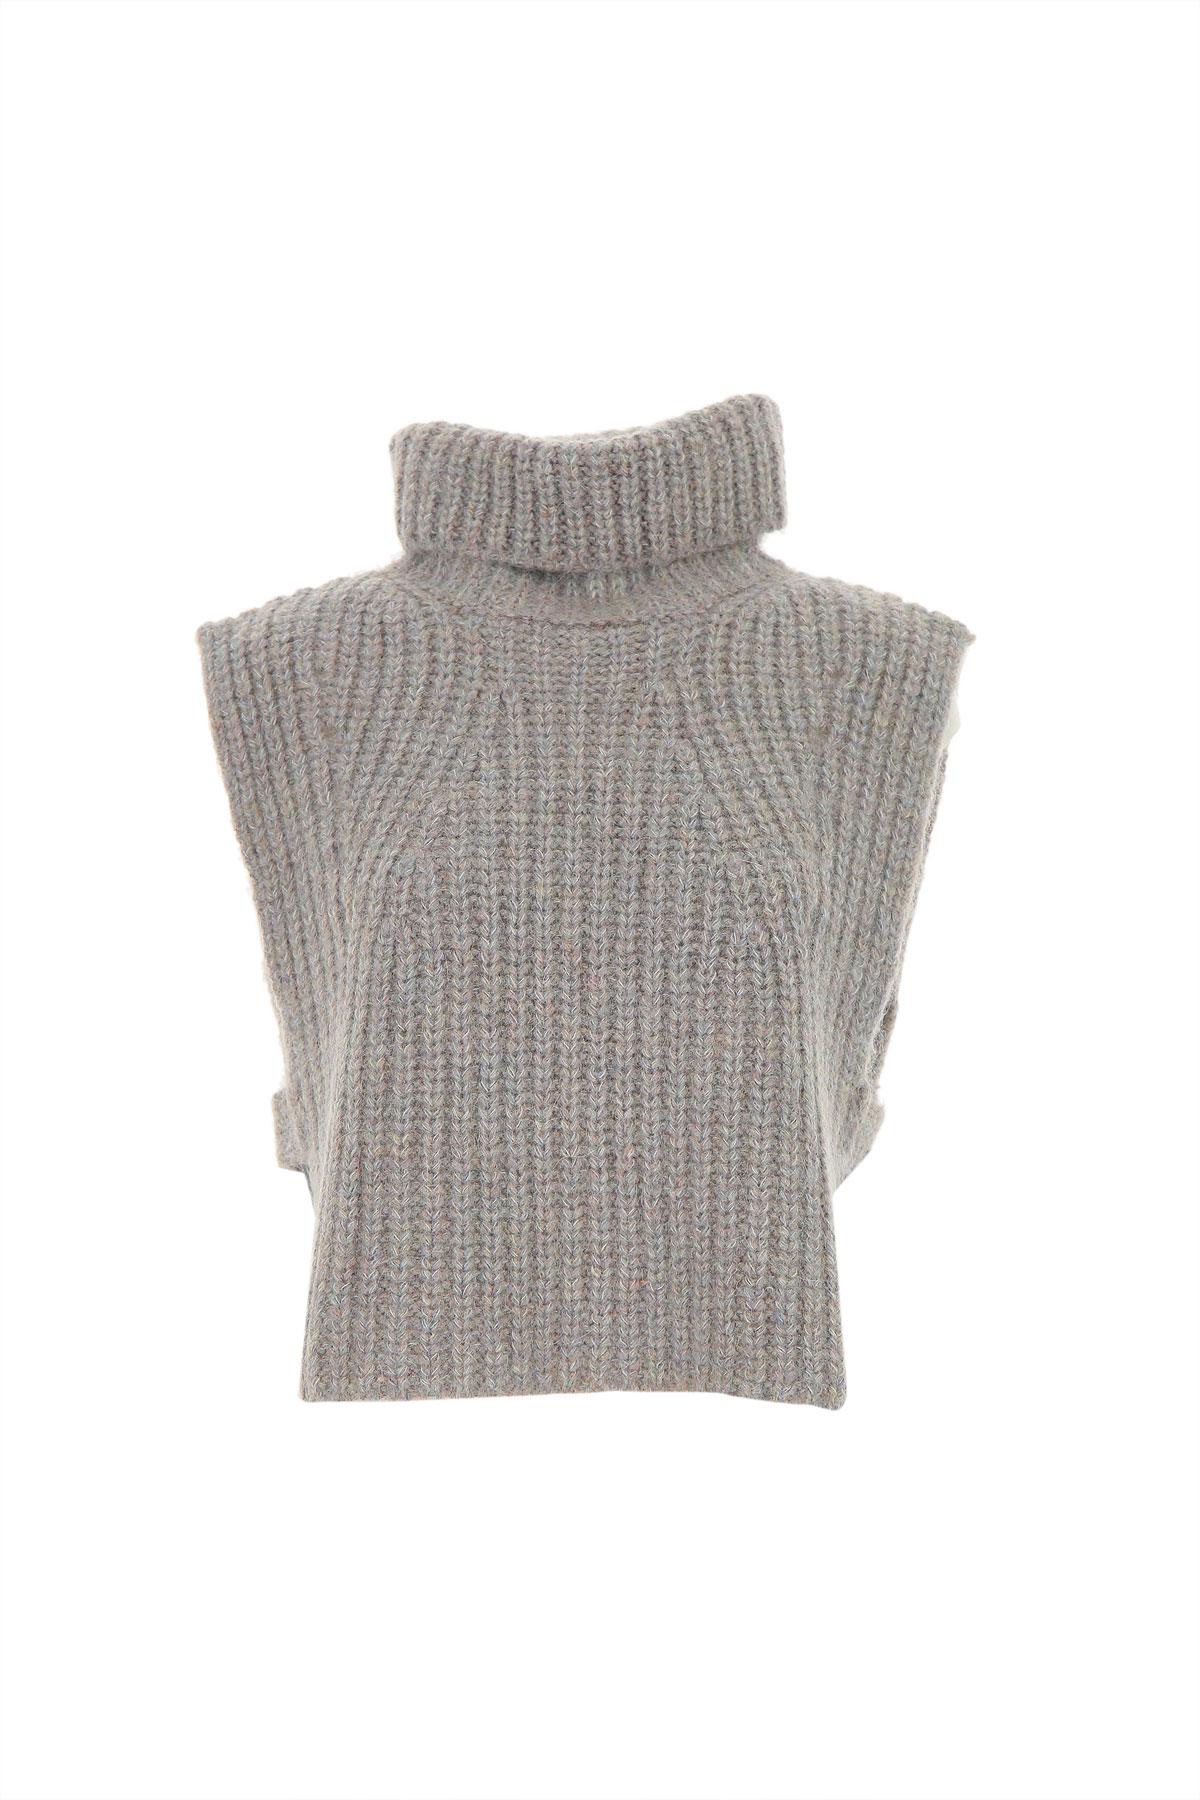 Isabel Marant Sweater for Women Jumper On Sale, Greyish Blue, Wool, 2019, 6